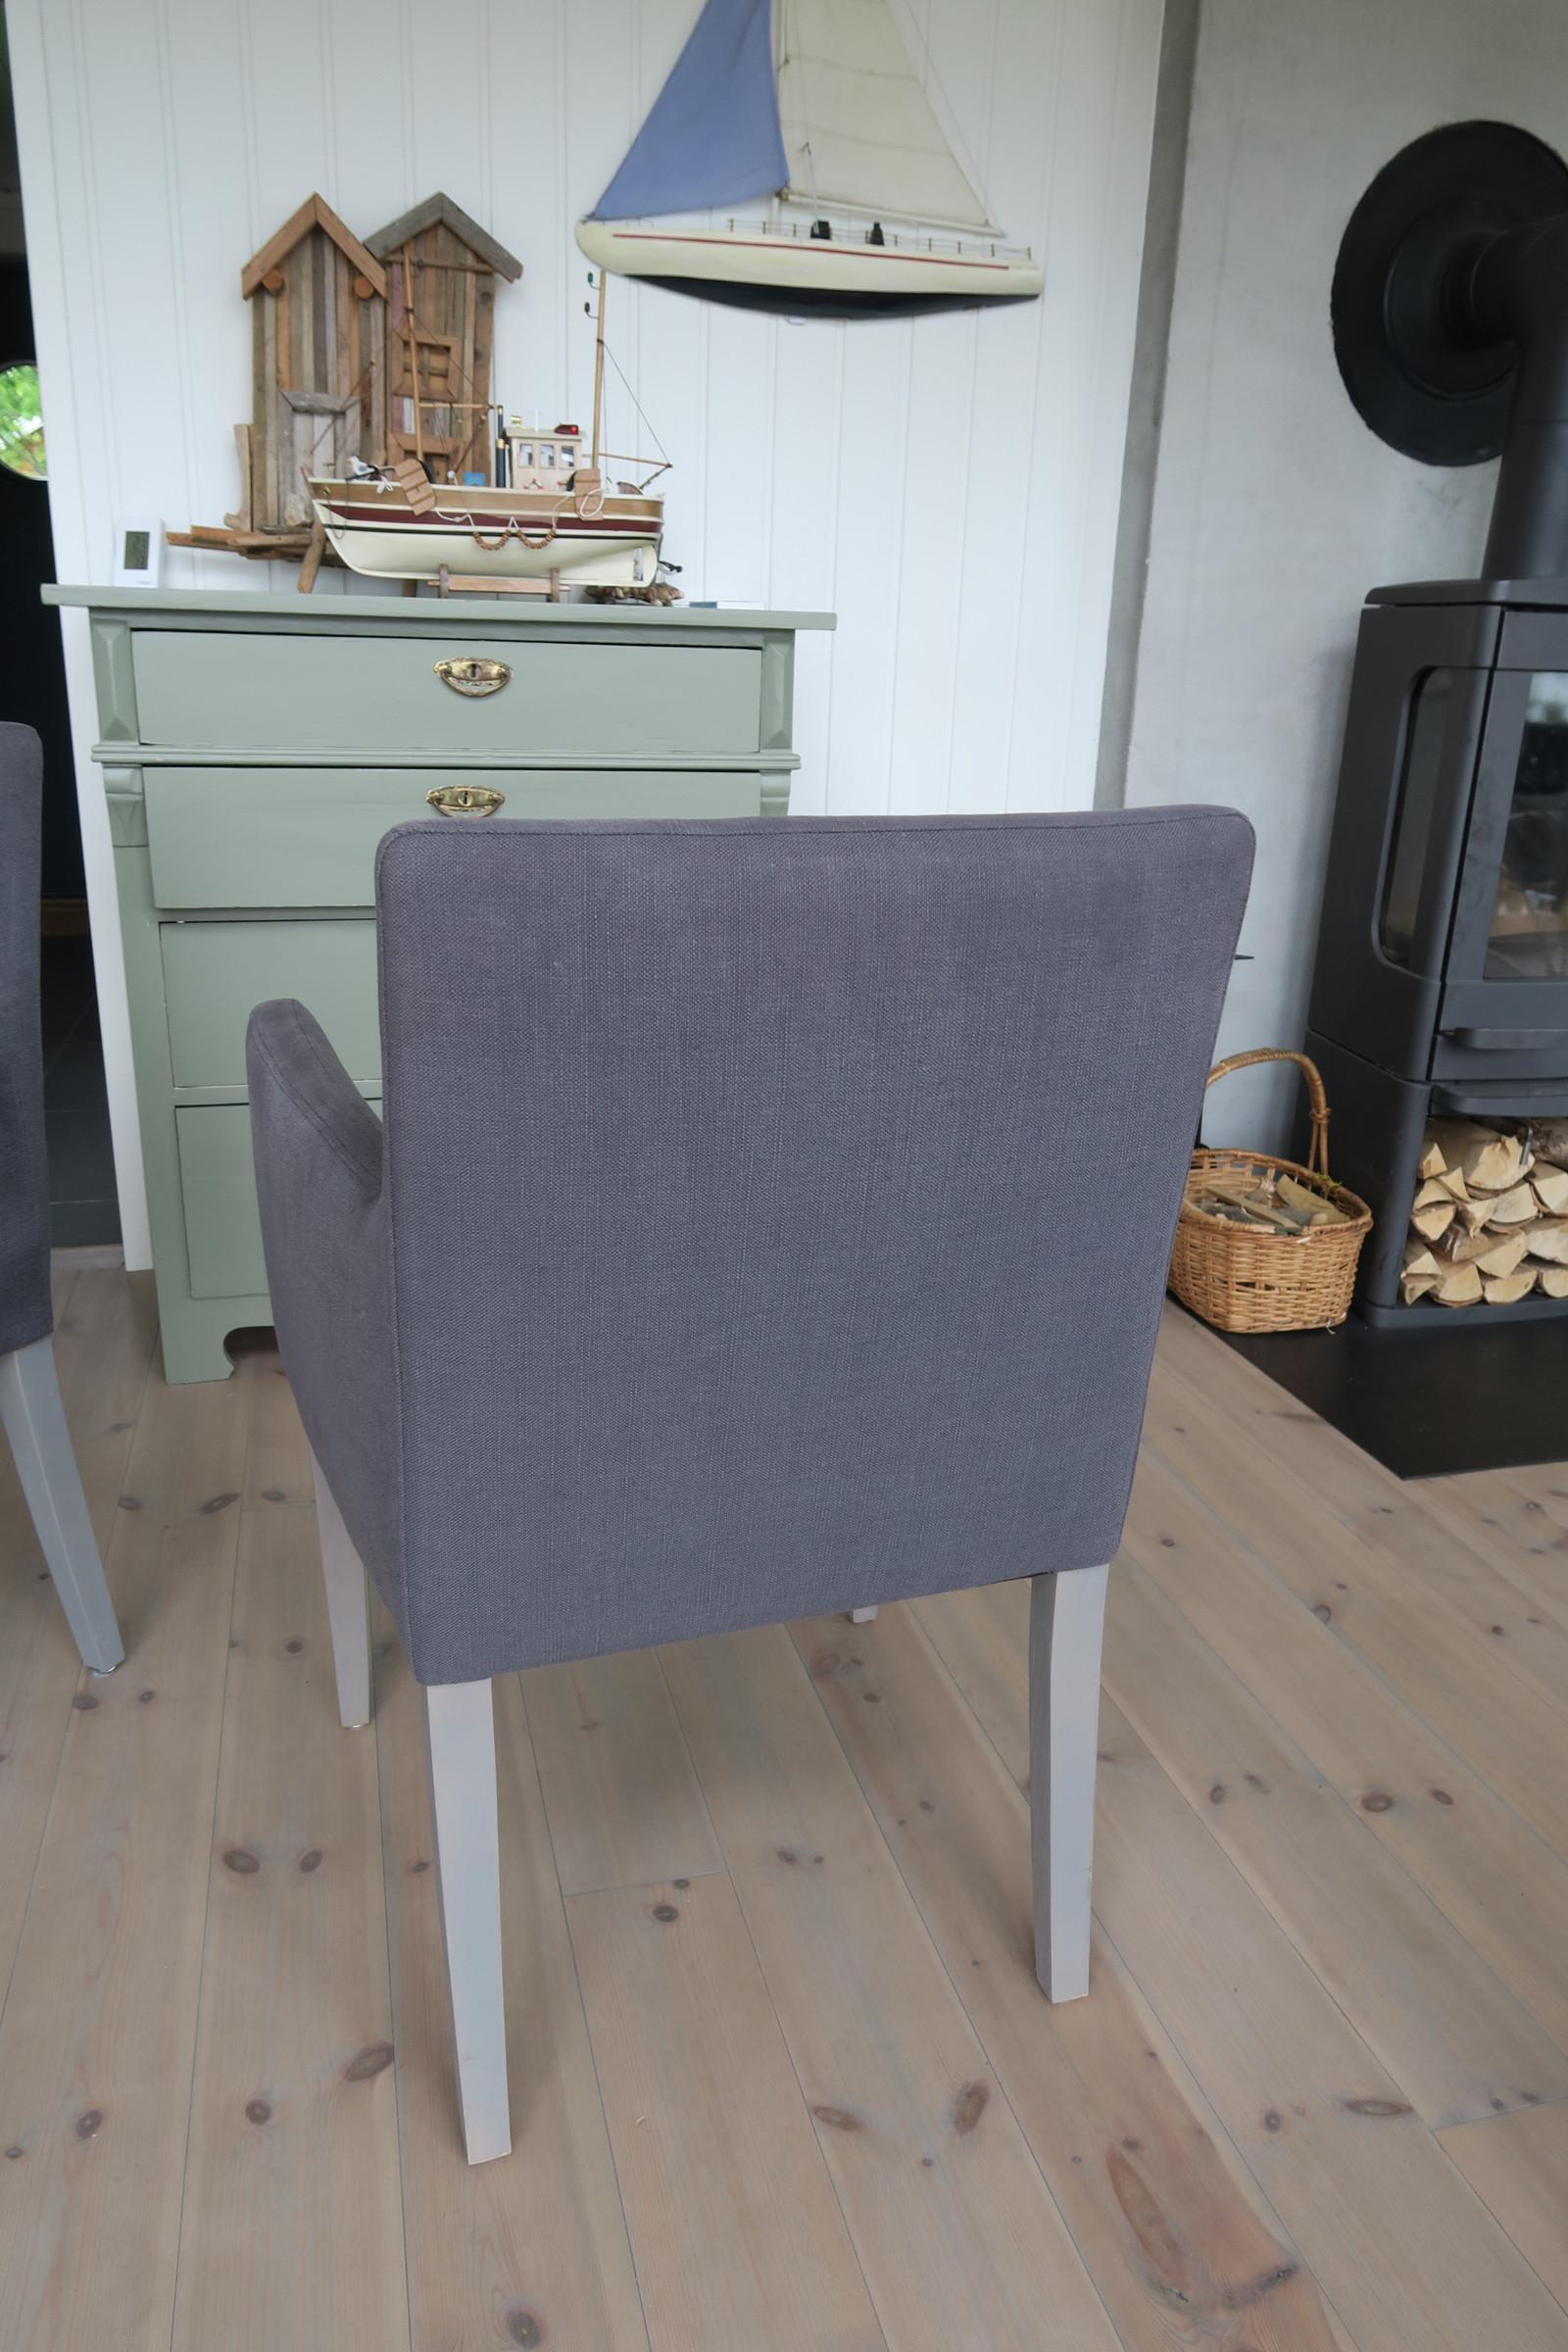 Home & Cottage – «Celine» spisestoler i grått stoff med grå